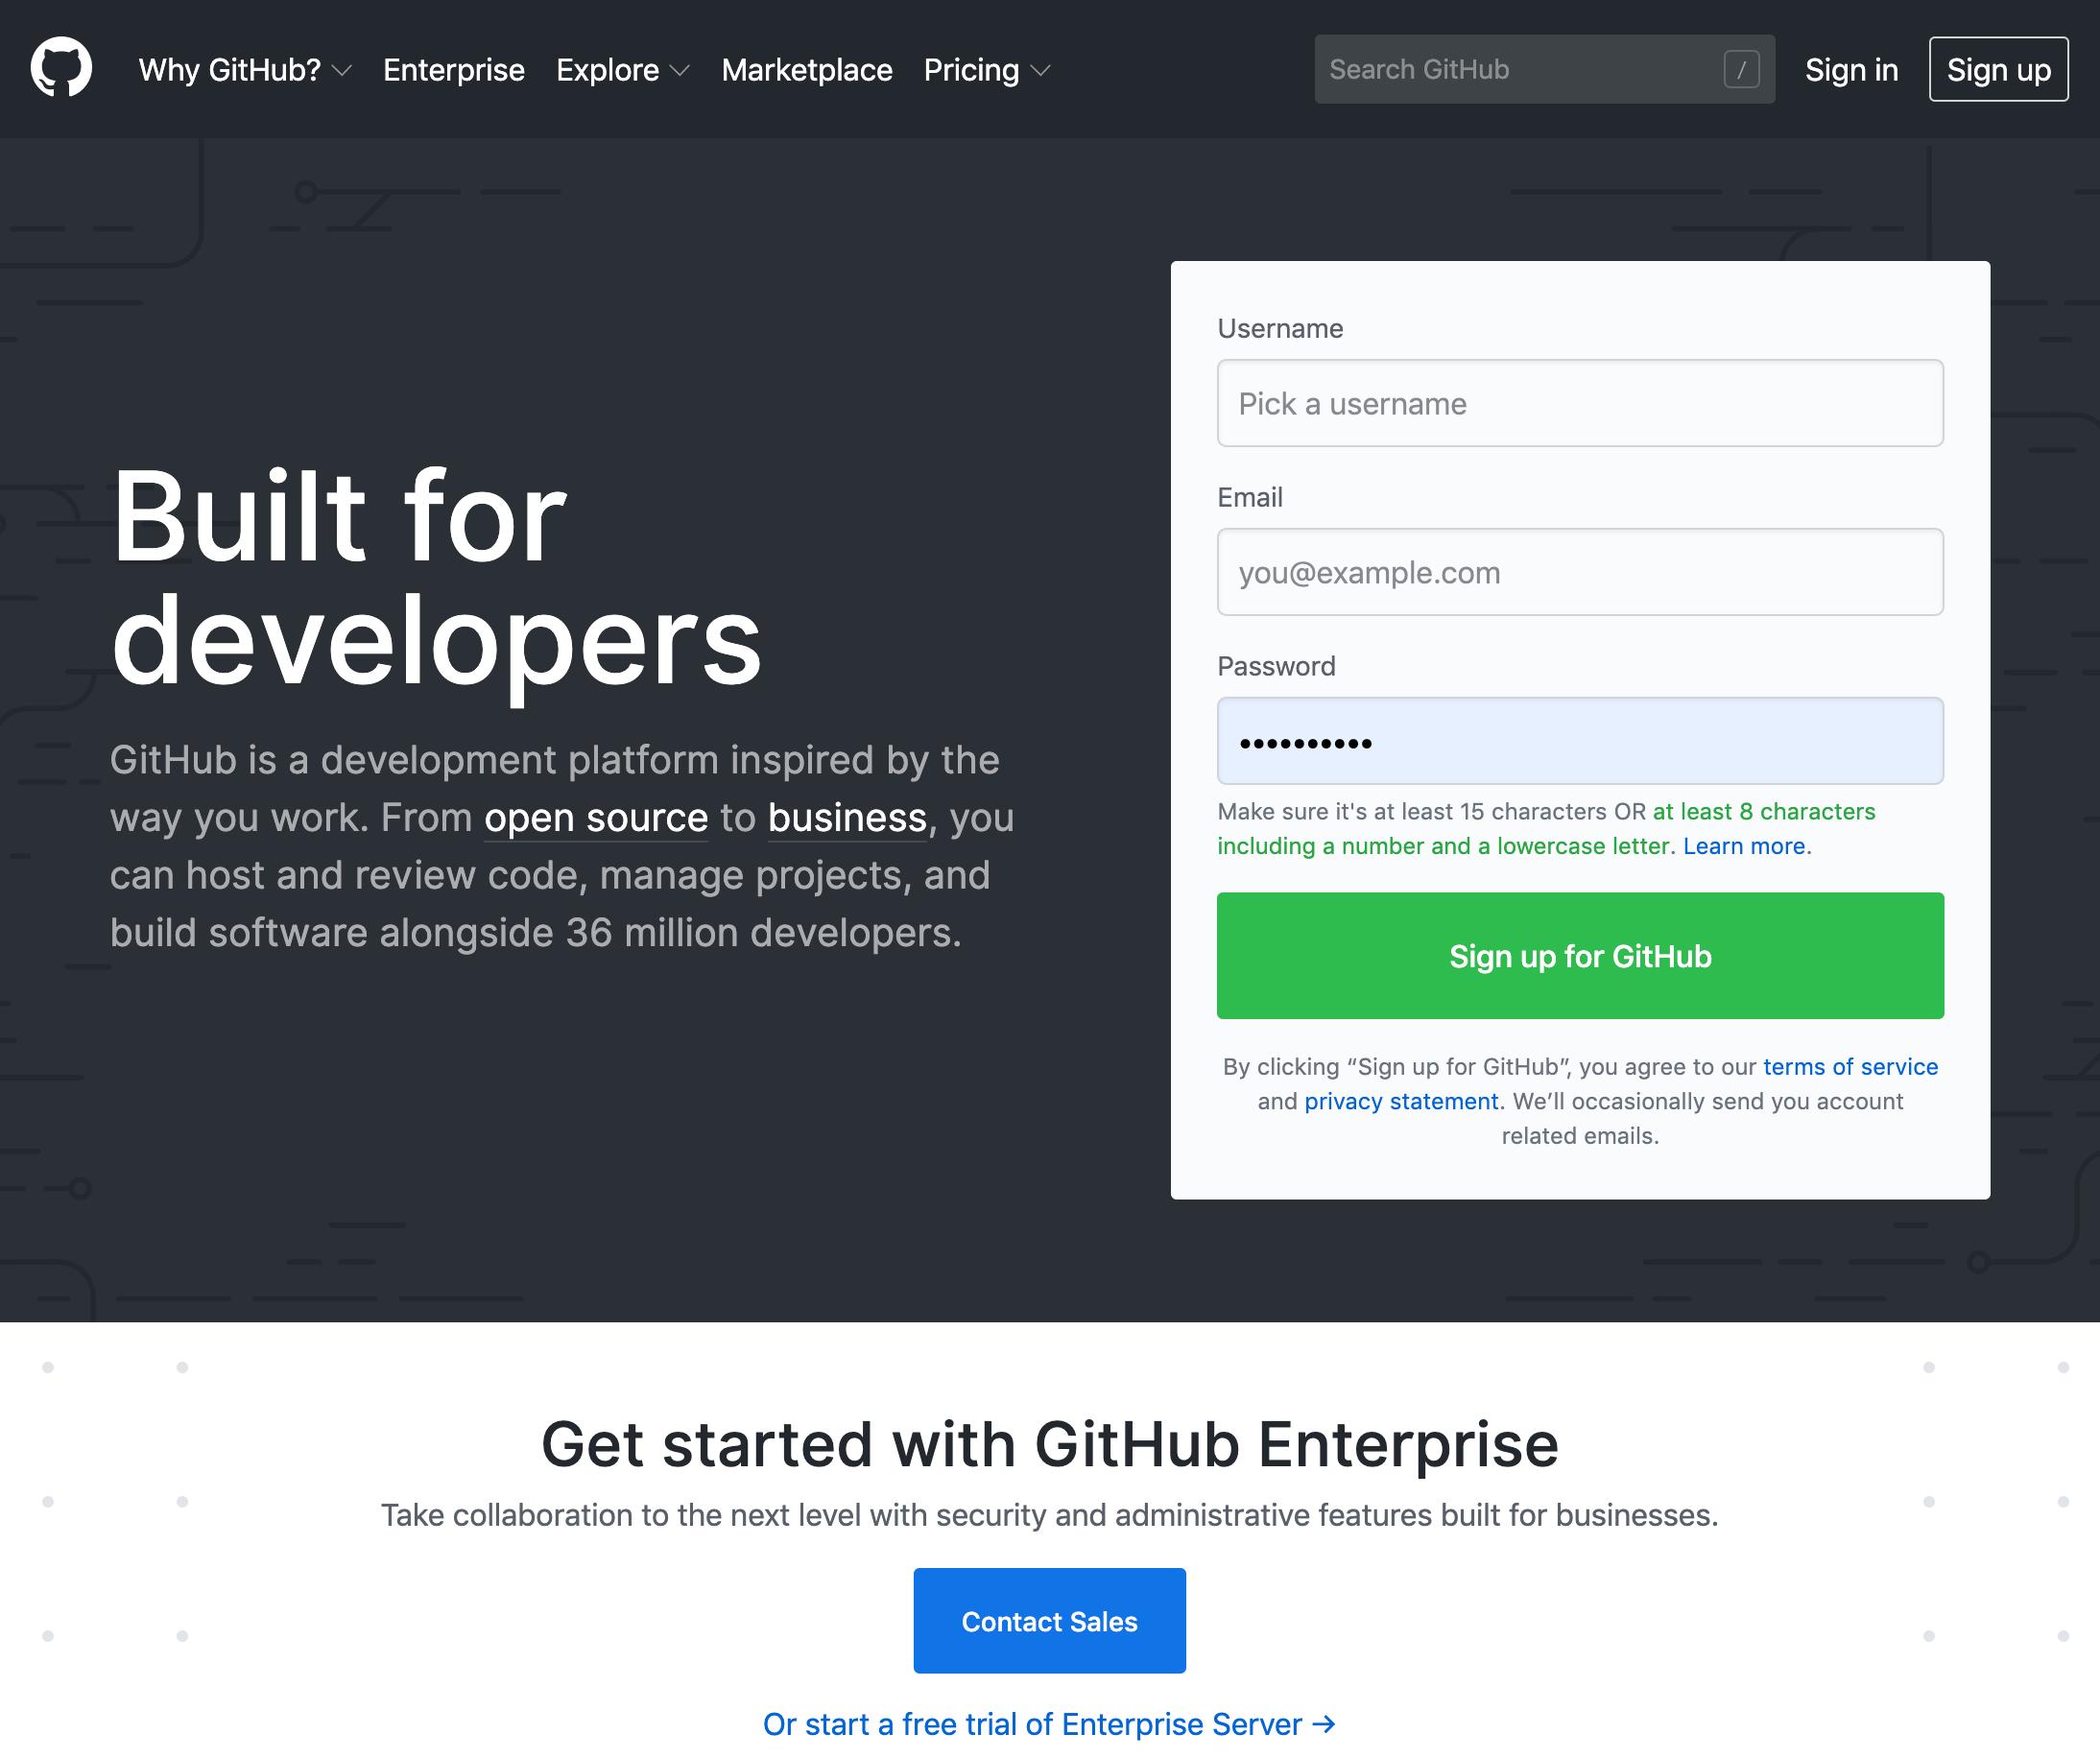 FireShot Capture 006 - The world's leading software development platform · GitHub - github.com.png